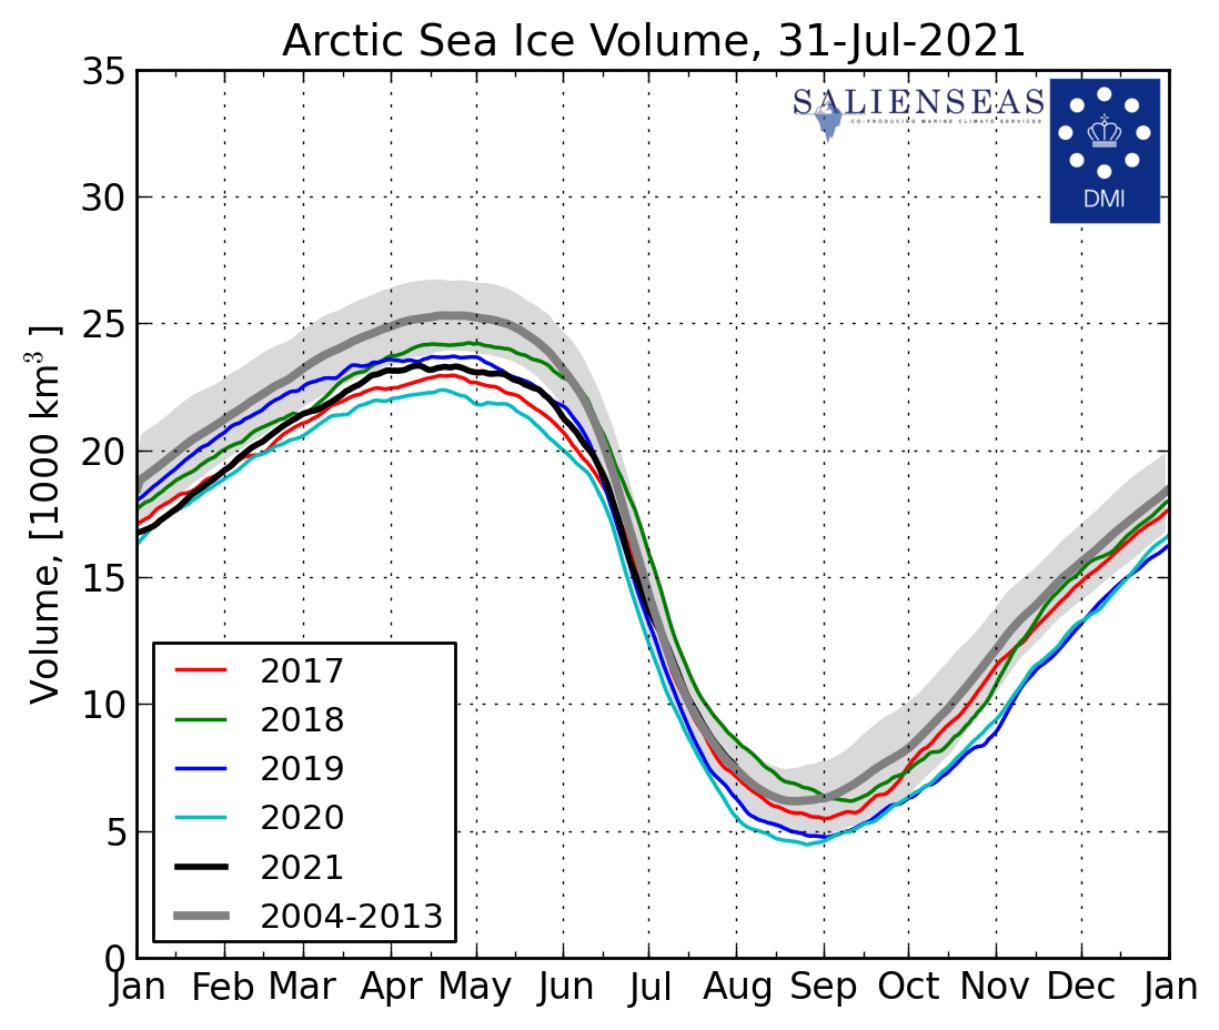 arctic-ocean-sea-ice-volume-analysis-graph